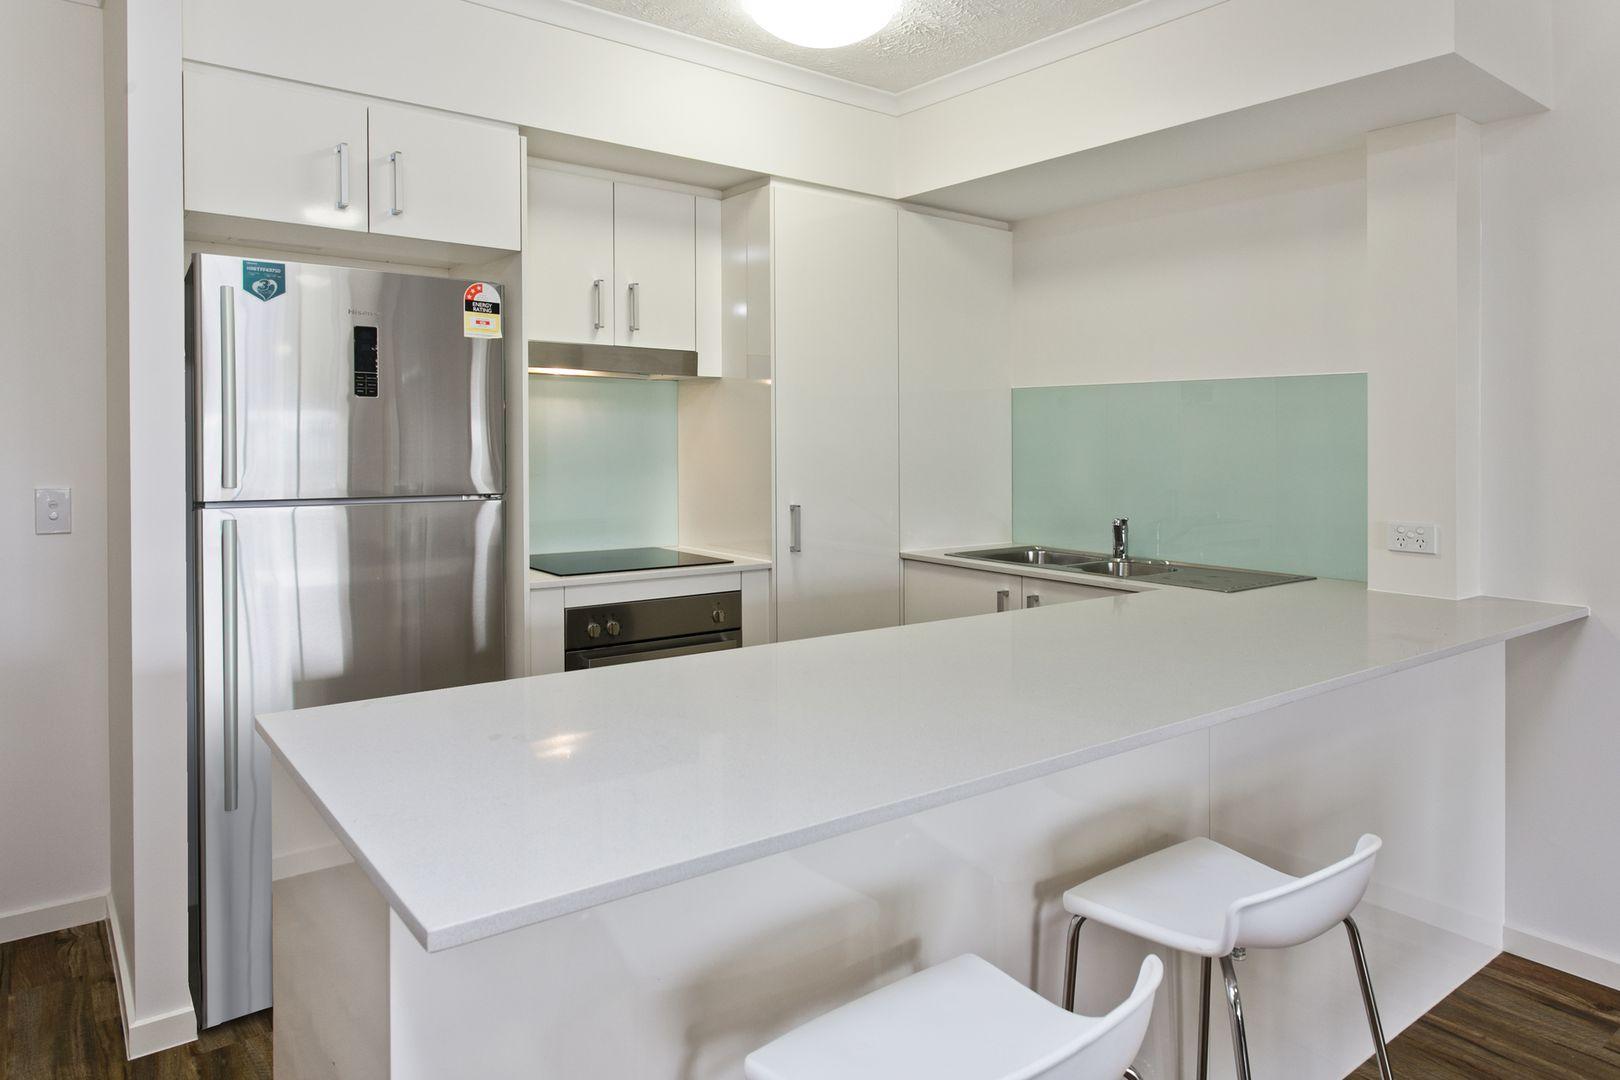 43/45 Regent St, Woolloongabba QLD 4102, Image 0